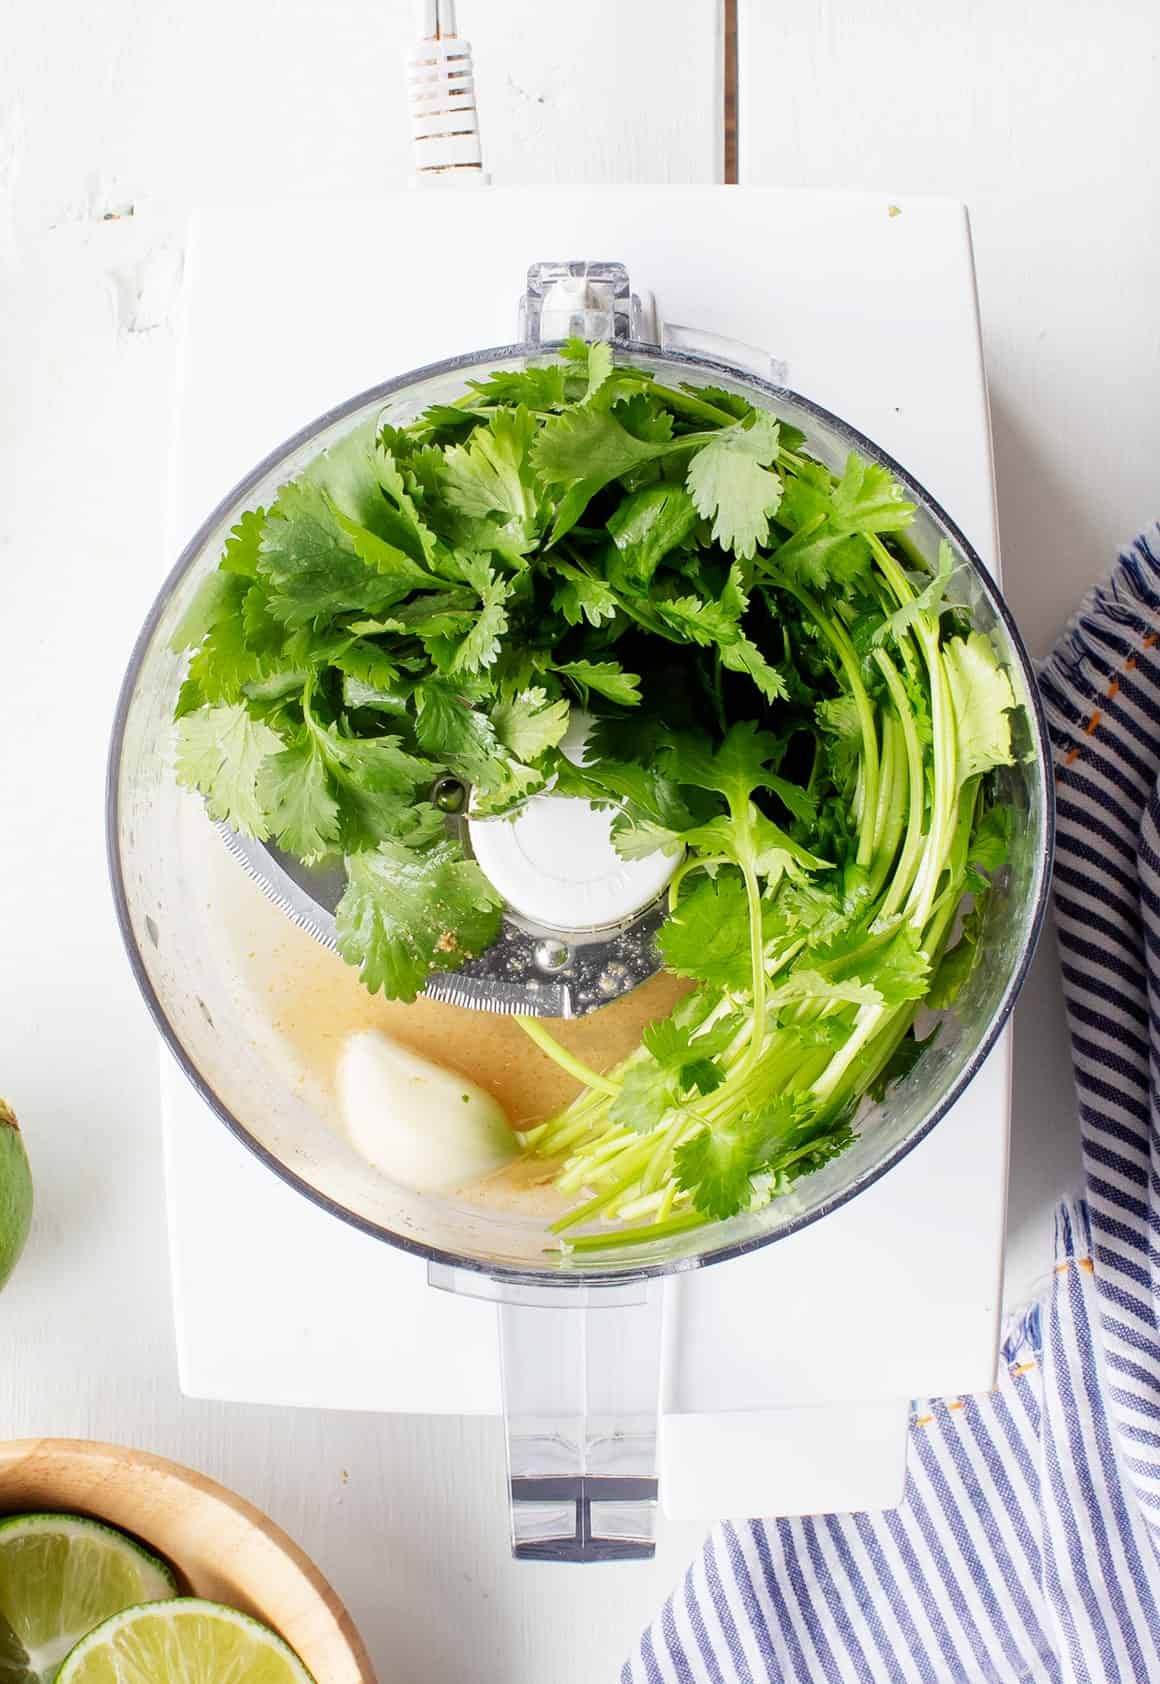 Cilantro lime salad dressing